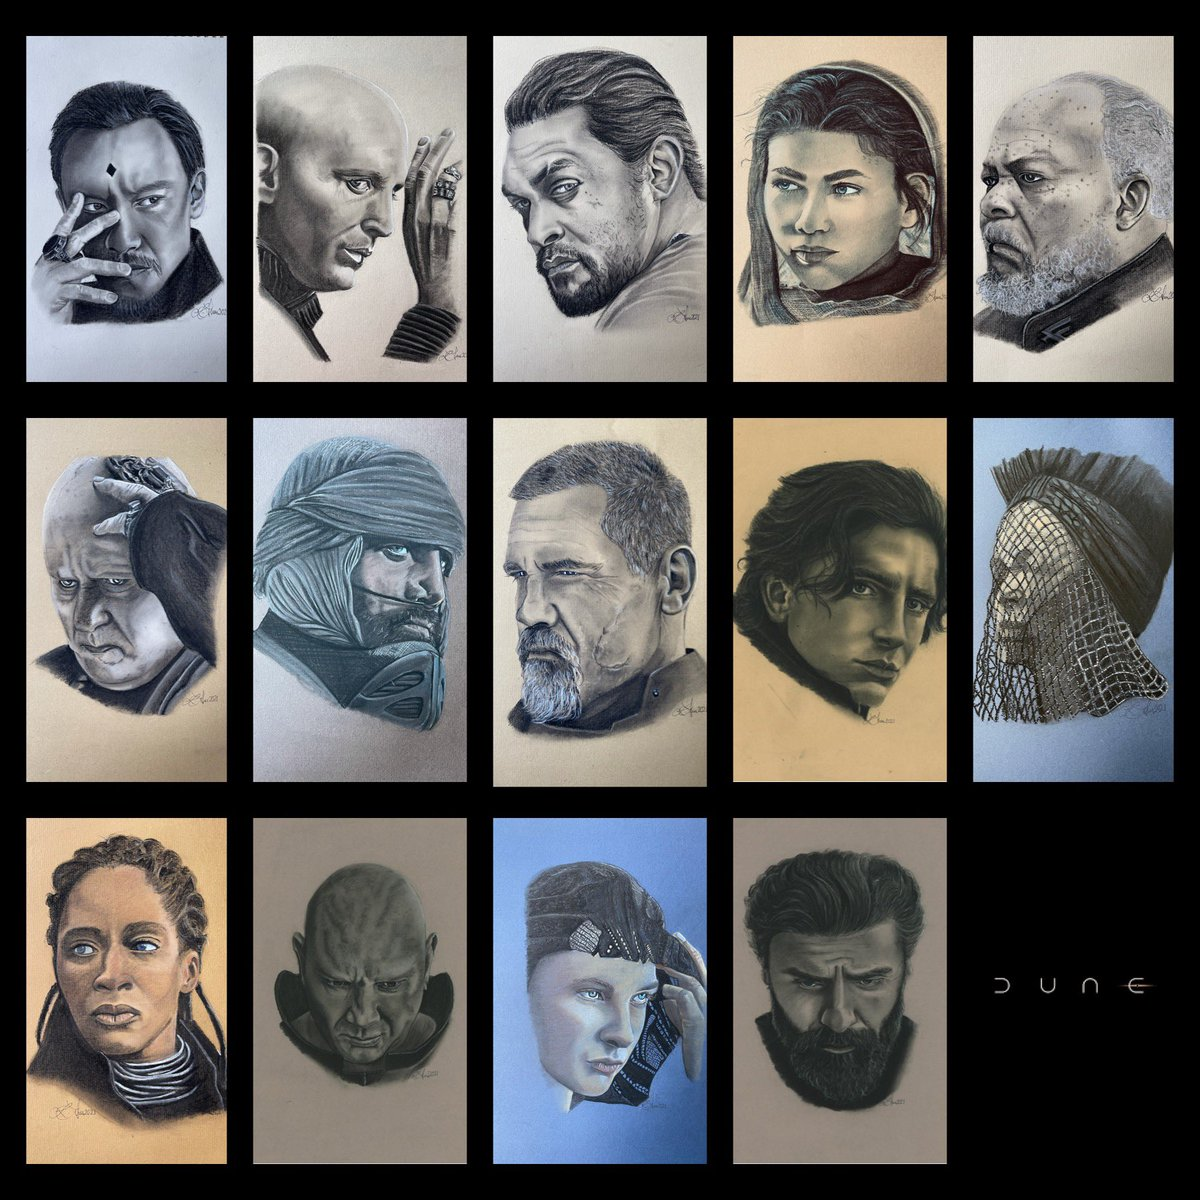 Finally! @dunemovie is out today's. Here's all the portraits I've drawn, inspired by the original 📷 @jasonbellphoto  #dune #DuneMovie #PaulAtreides #dukeleto #LadyJessica #gurney #DuncanIdaho #lietkynes #baron #dryueh #chani #stilgar #rabban #piterdevries https://t.co/jAfJGRHTr0.